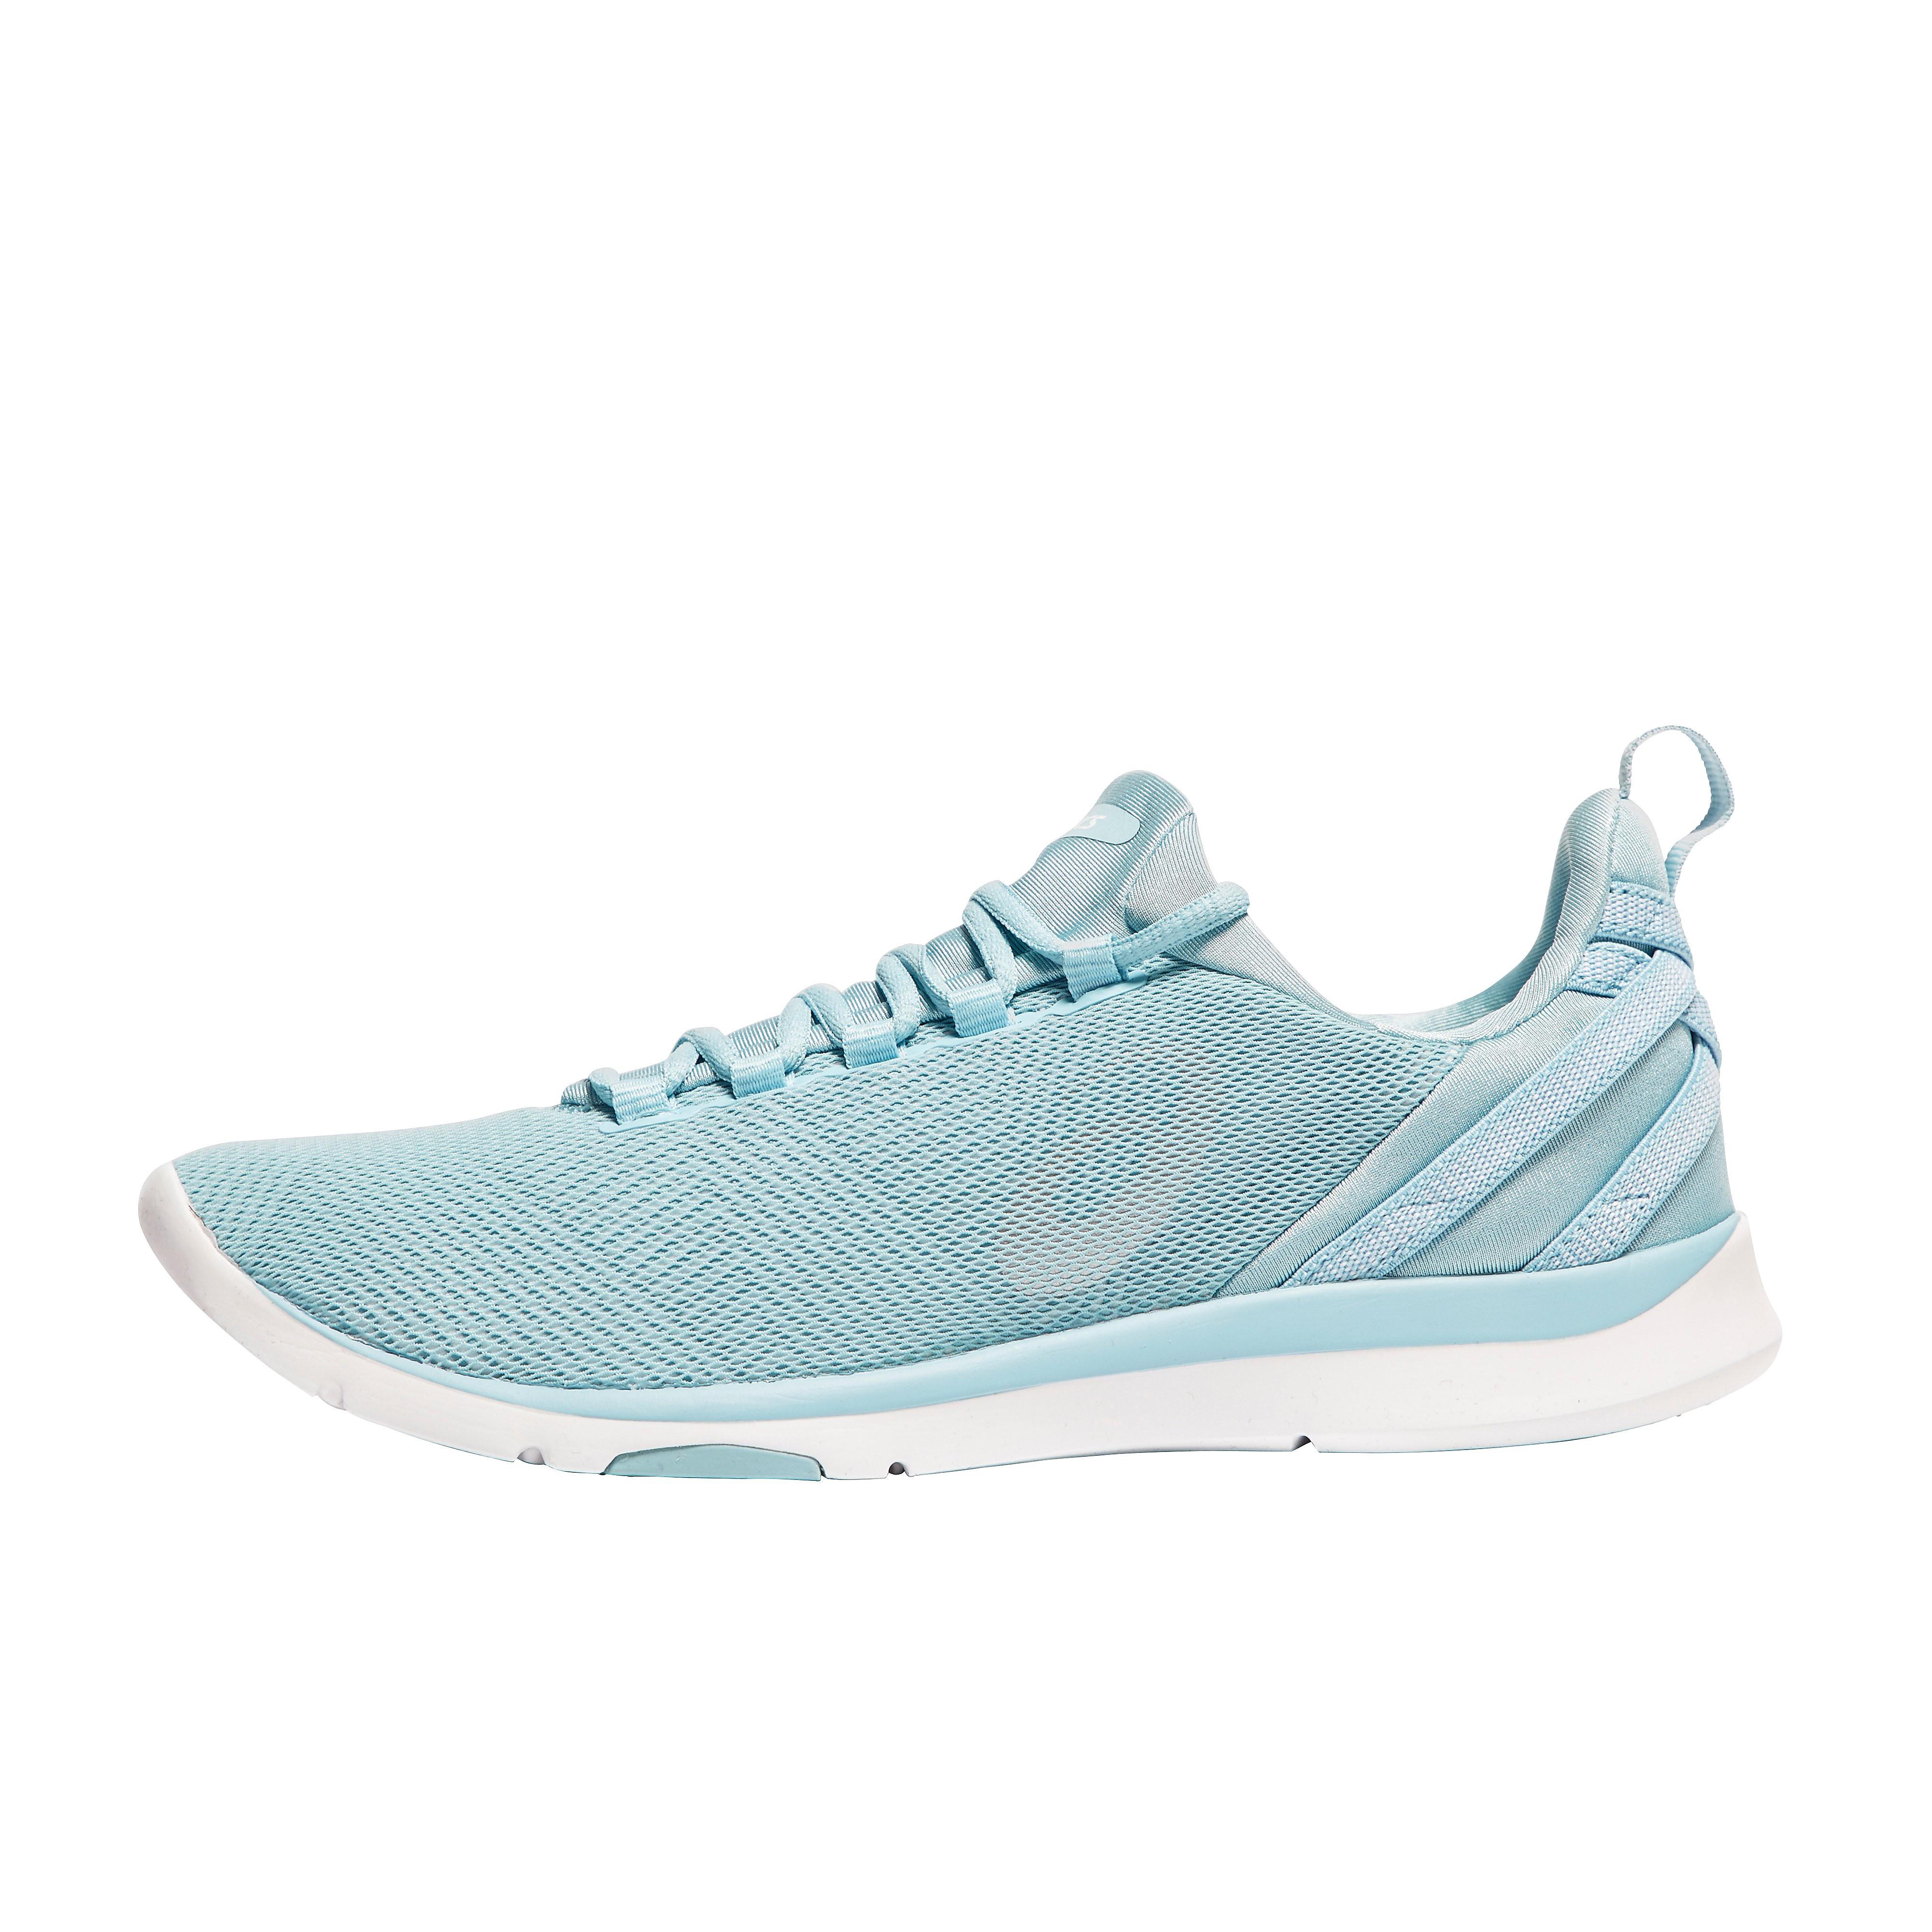 ASICS GEL-Fit Sana 3 Women's Training Shoes